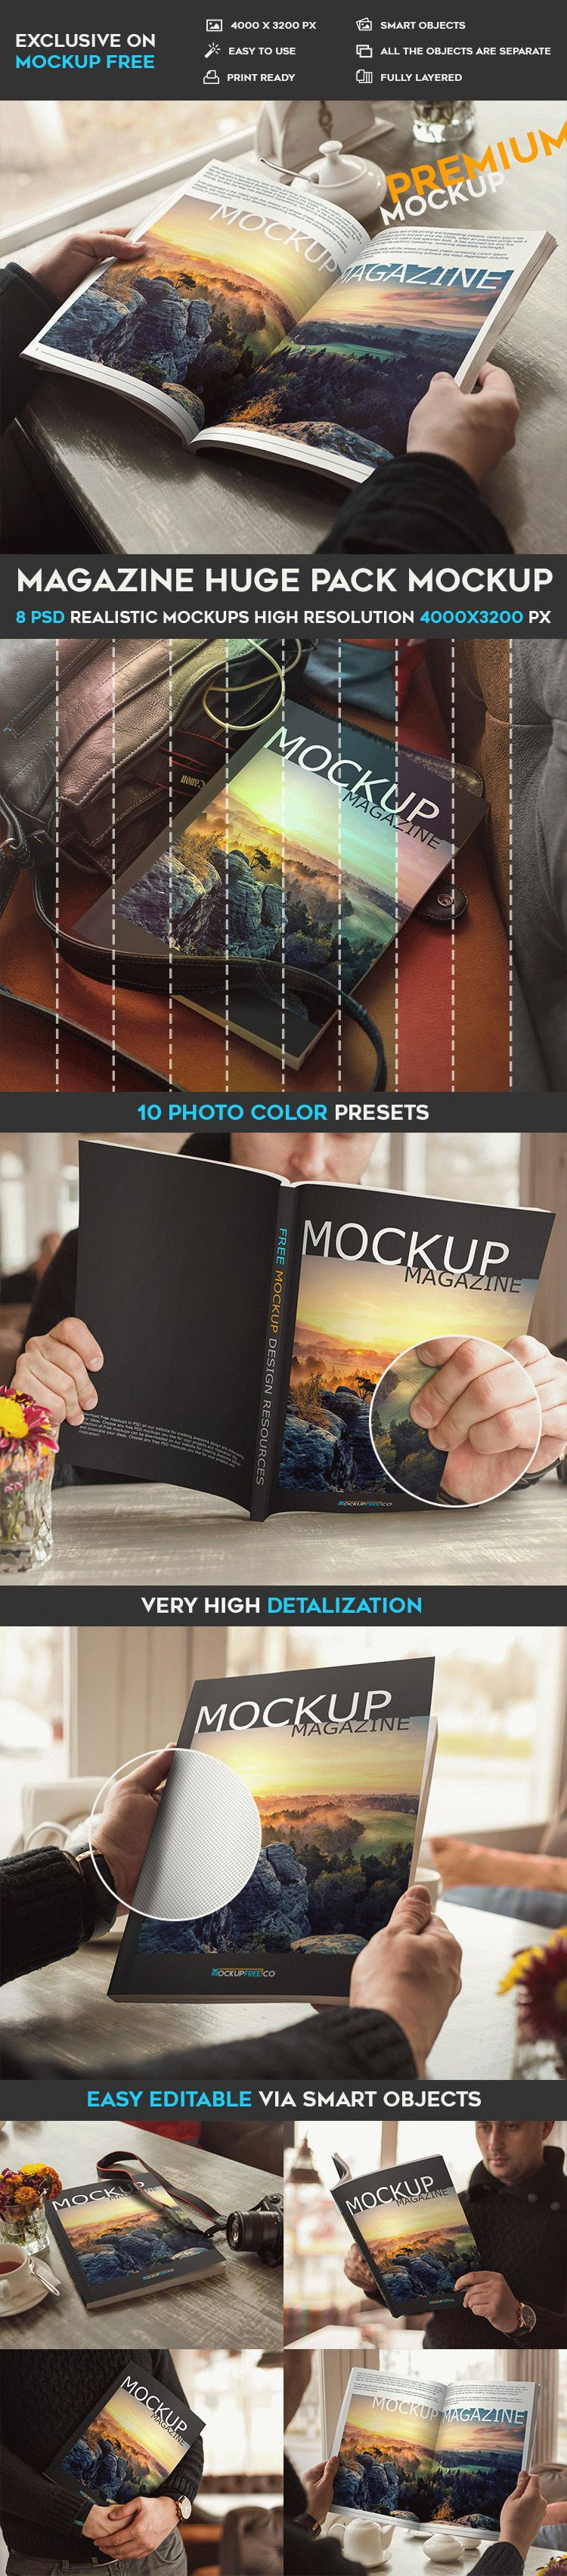 bigpreview_magazine-huge-pack-8-premium-psd-mockups